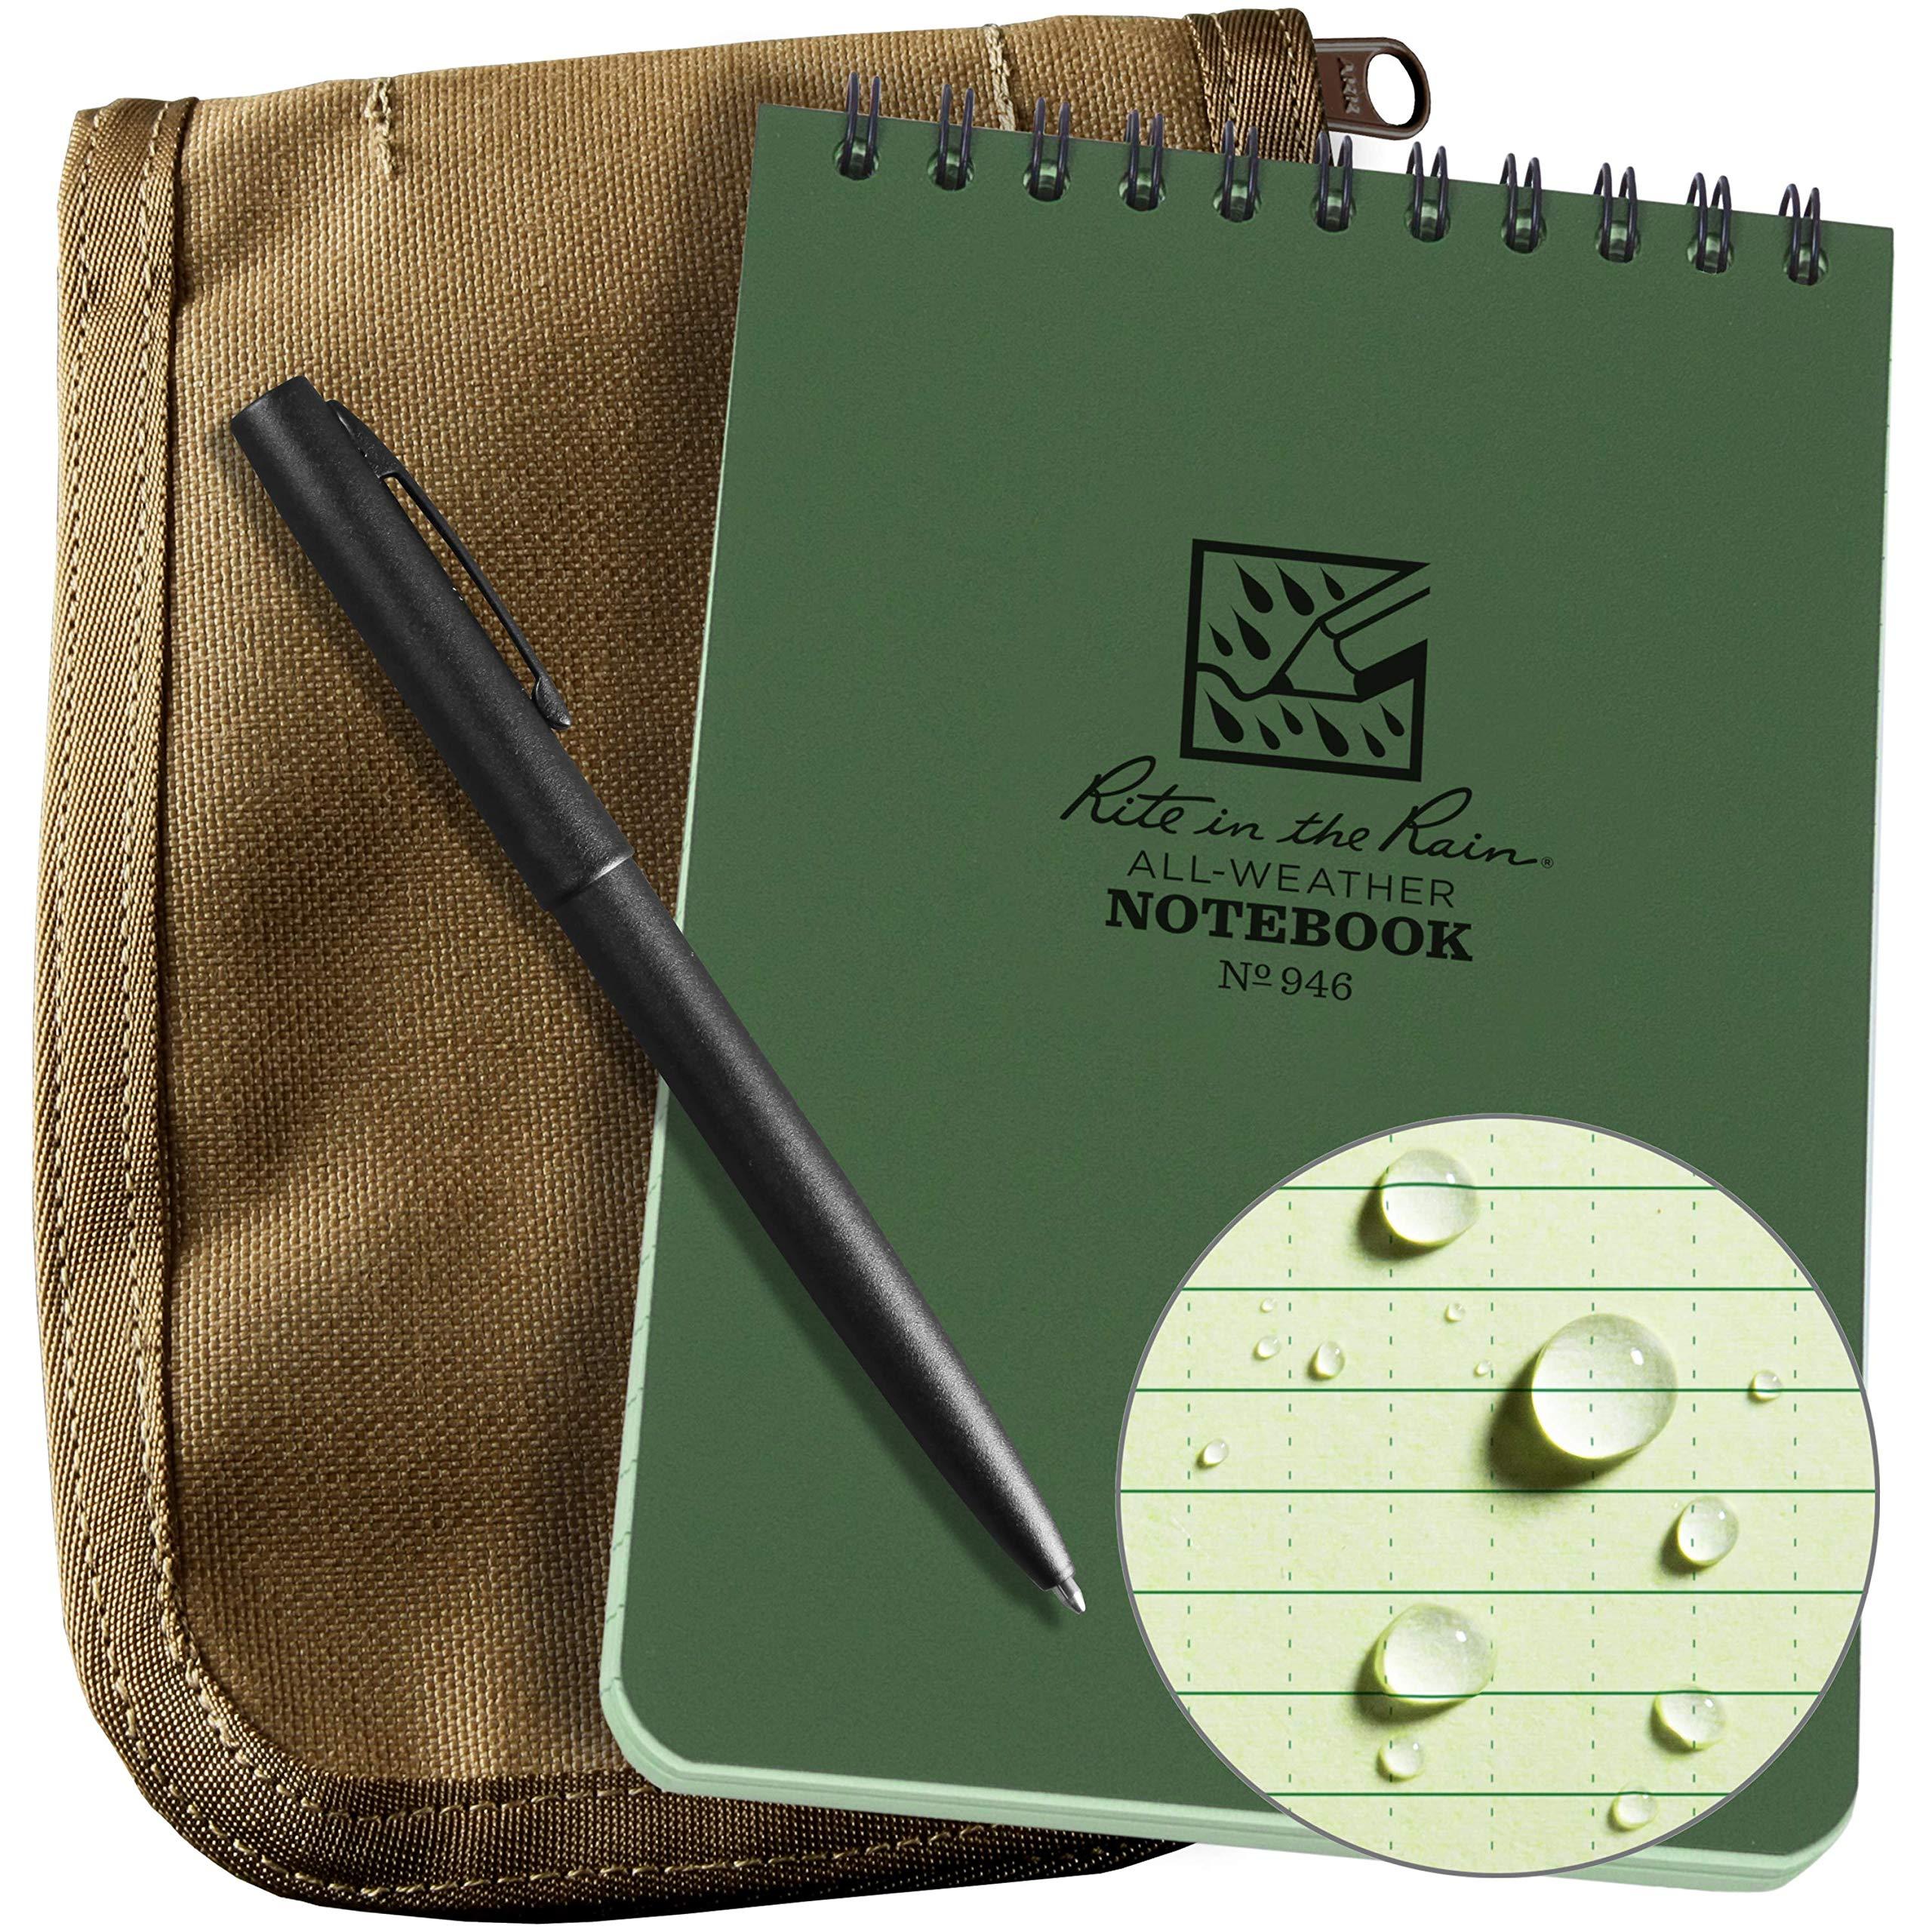 Rite In The Rain Weatherproof 3'' x 5'' Top-Spiral Notebook Kit: Tan Cordura Fabric Cover, 3'' x 5'' Green Notebook, and an Weatherproof Pen (No. 935-KIT) by Rite In The Rain